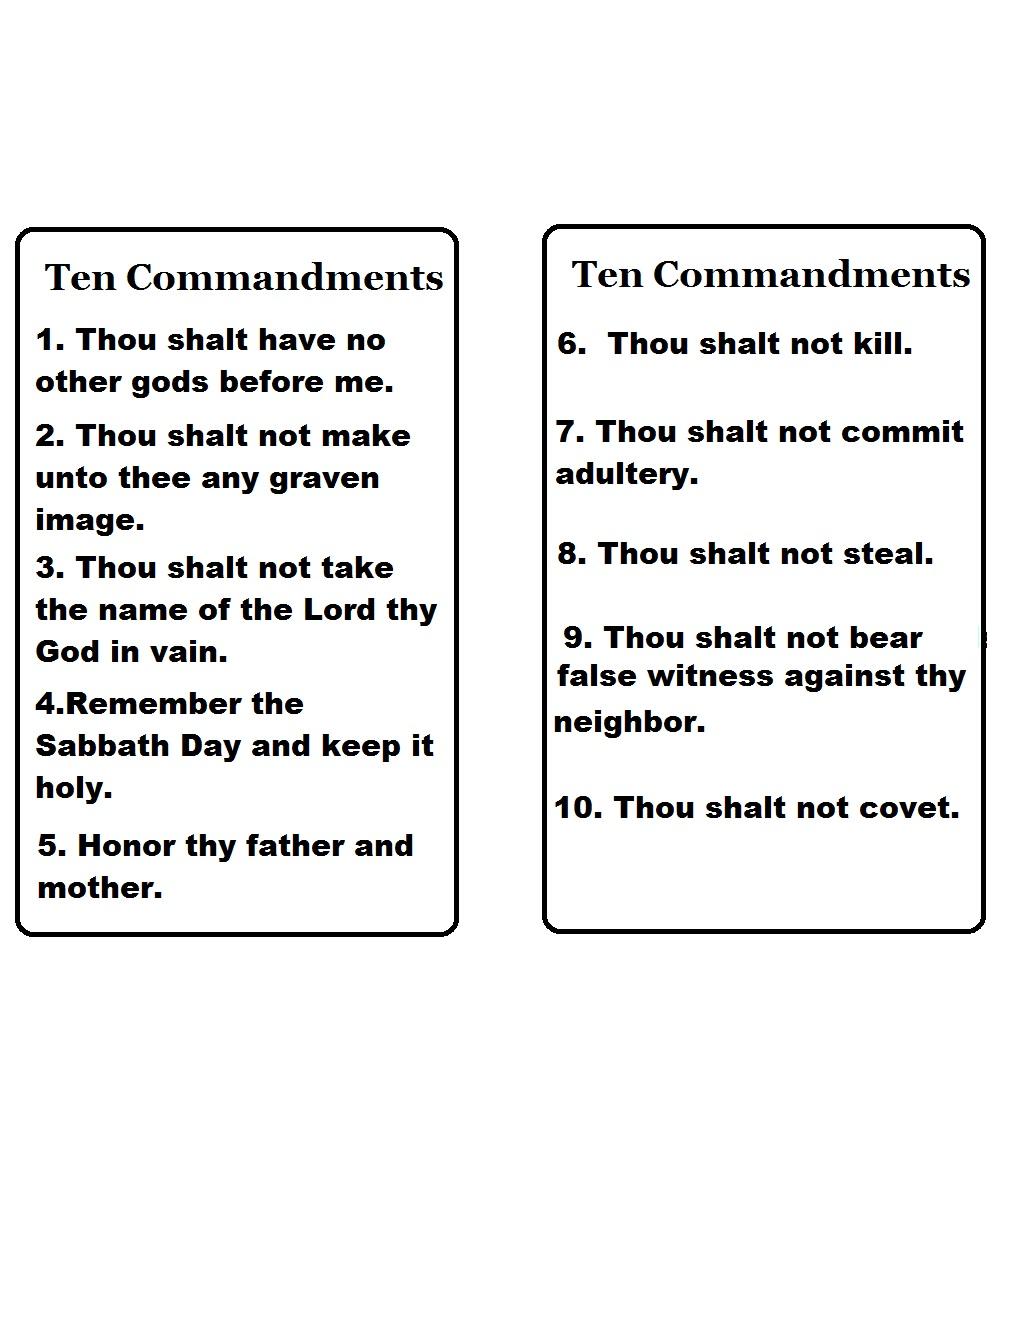 picture regarding 10 Commandments Printable Worksheets referred to as 10 Commandments Printable Worksheets